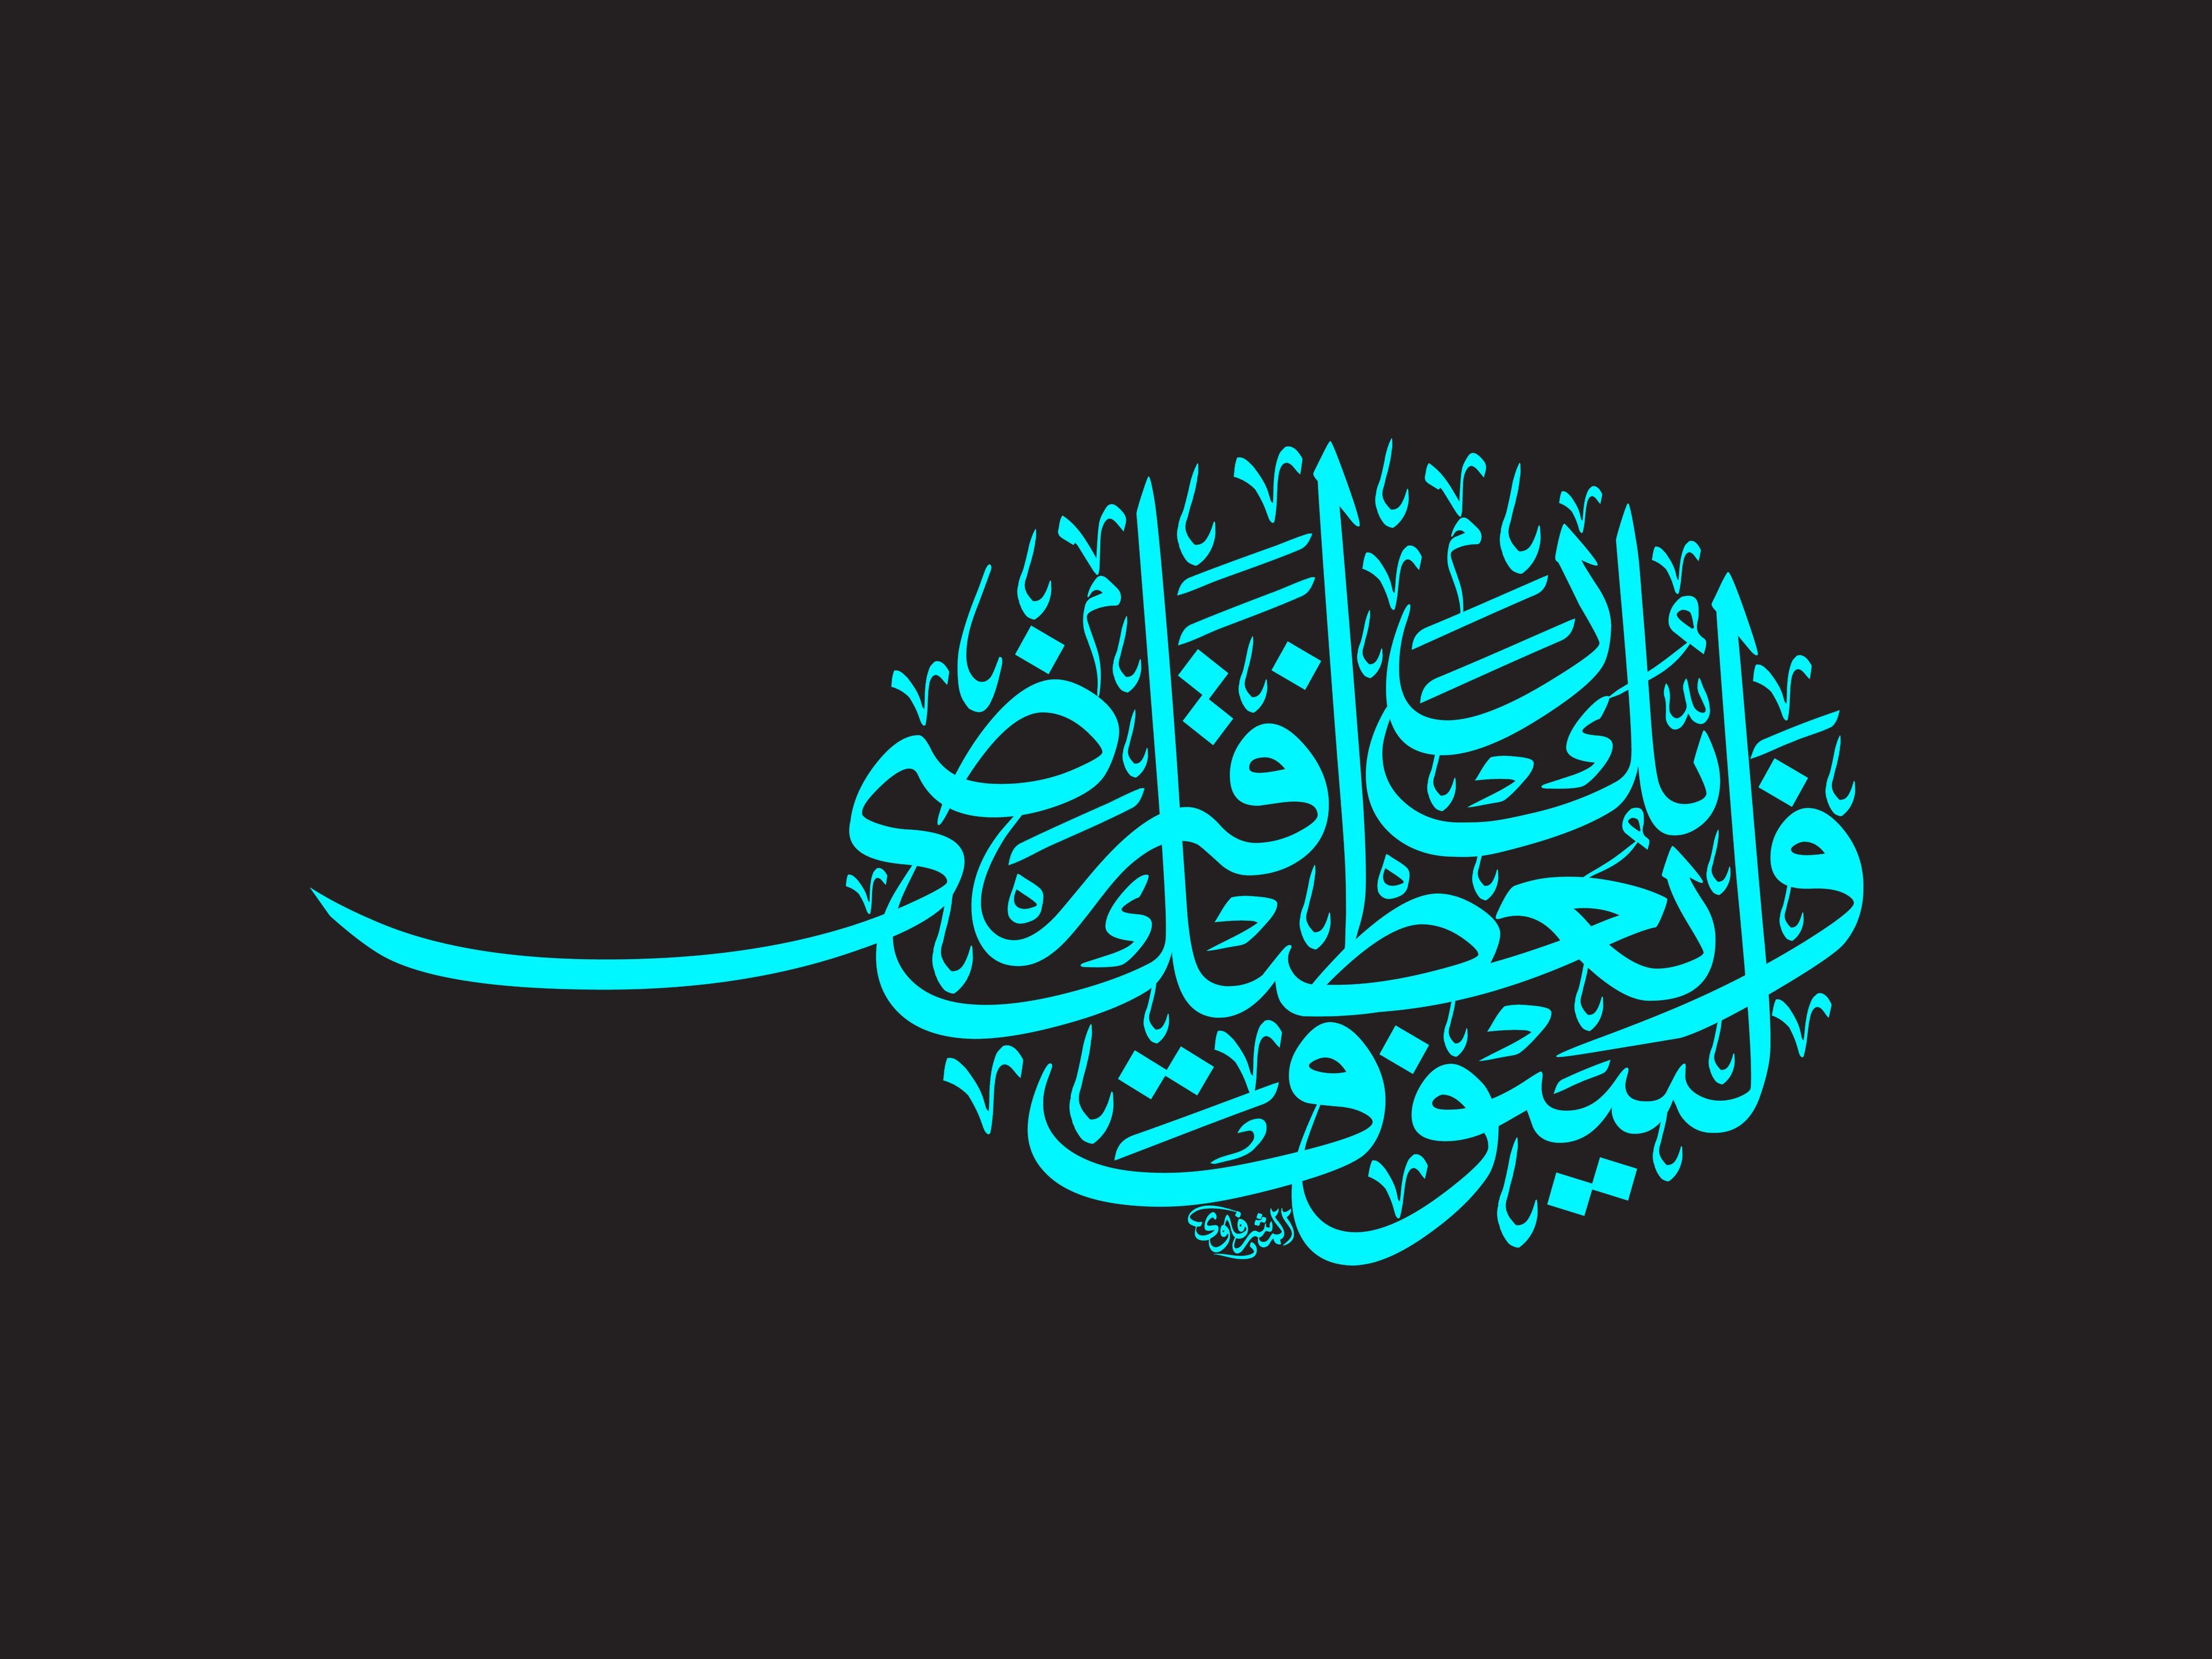 و ل س و ف ي ع ط يك ر ب ك ف ت ر ض ى Art Quotes Calligraphy